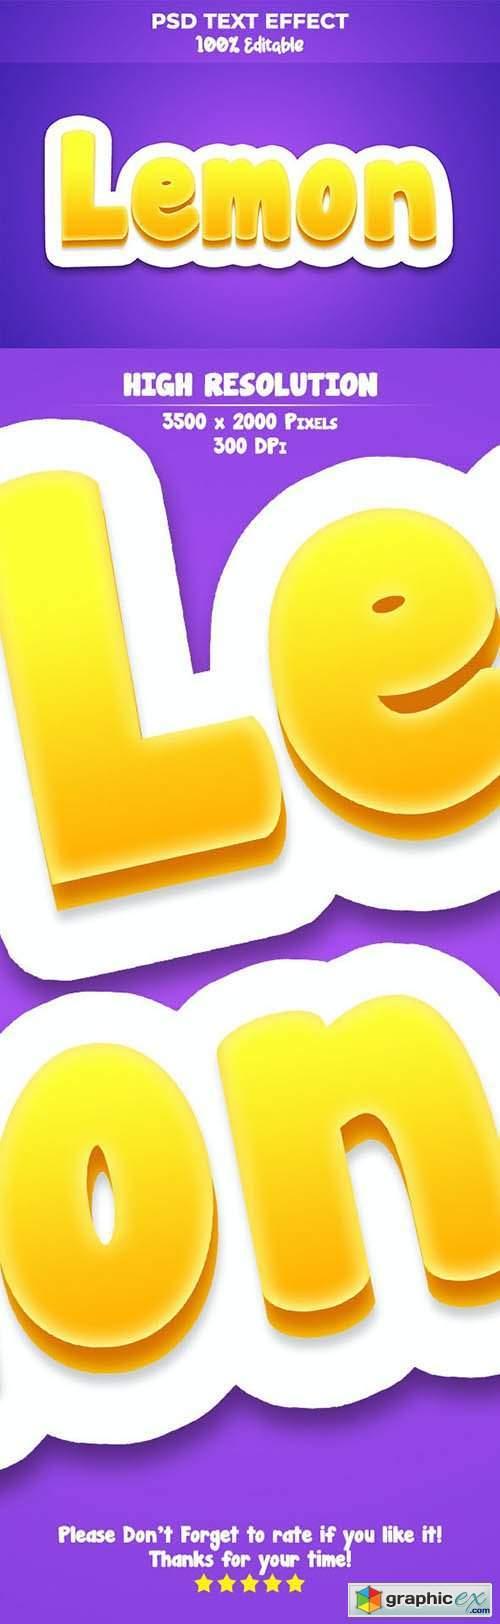 Cartoon Game Logo Text Effect